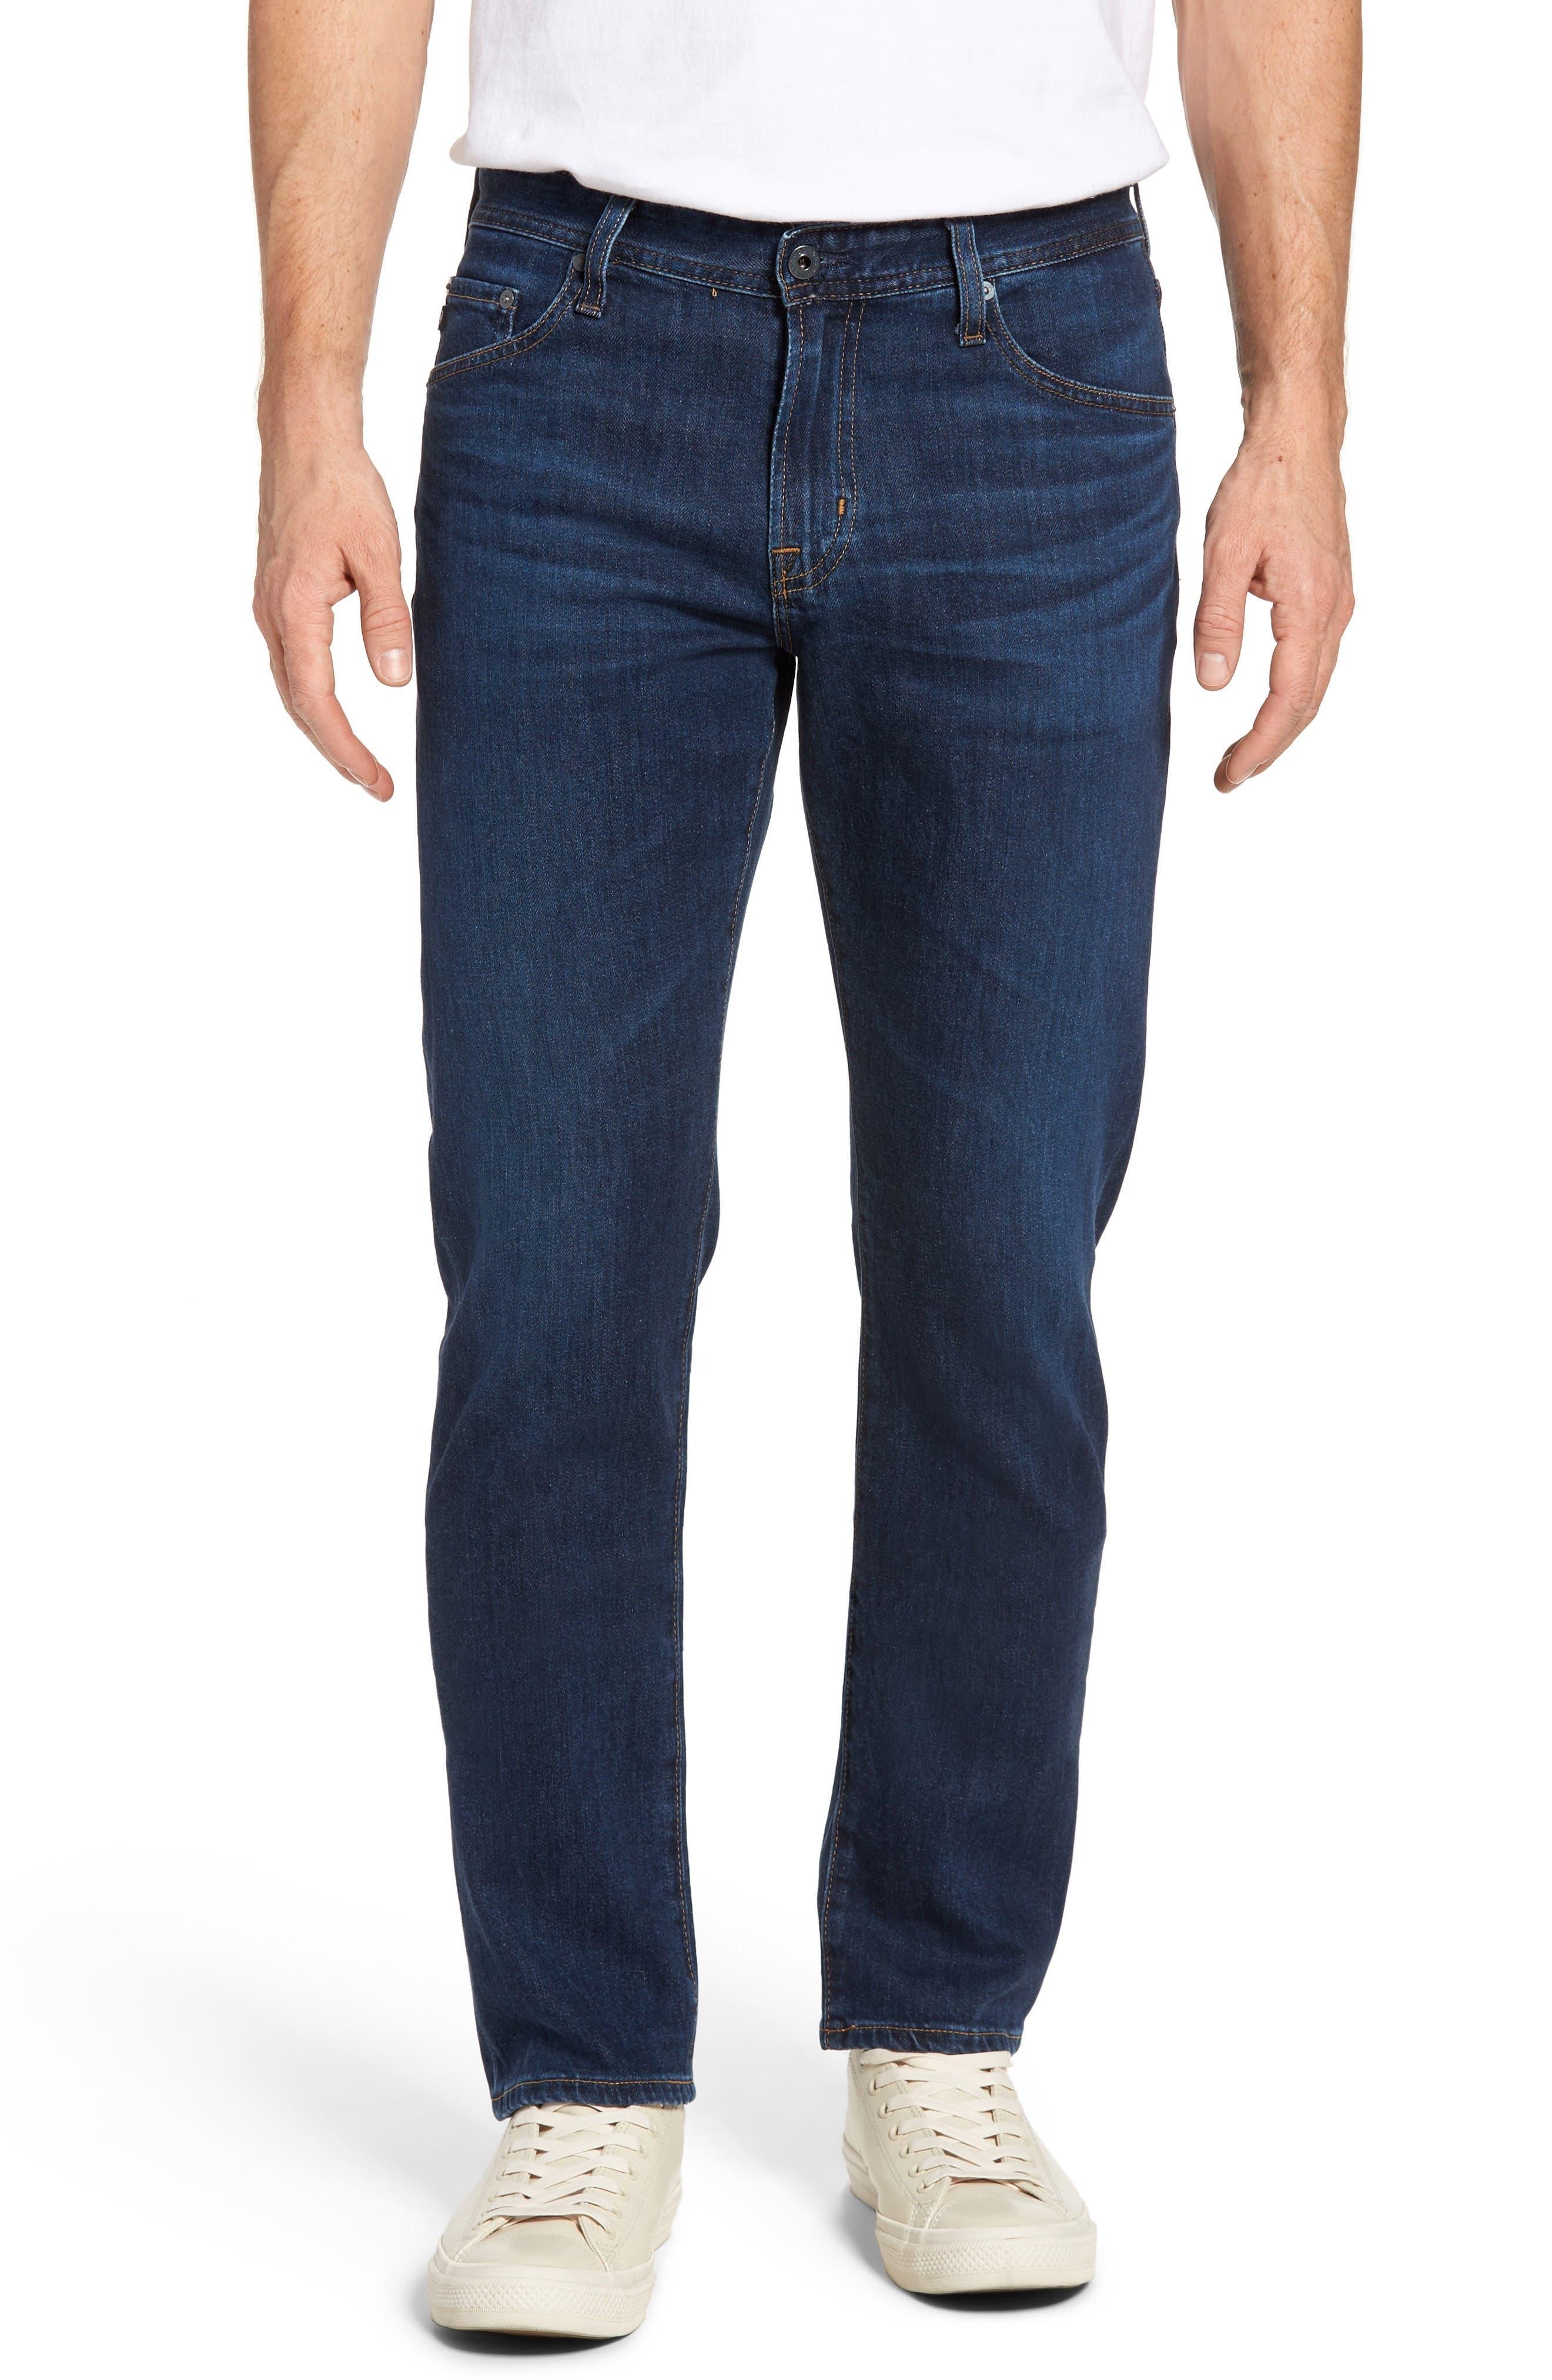 Graduate Slim Straight Leg Jeans,                         Main,                         color, 435